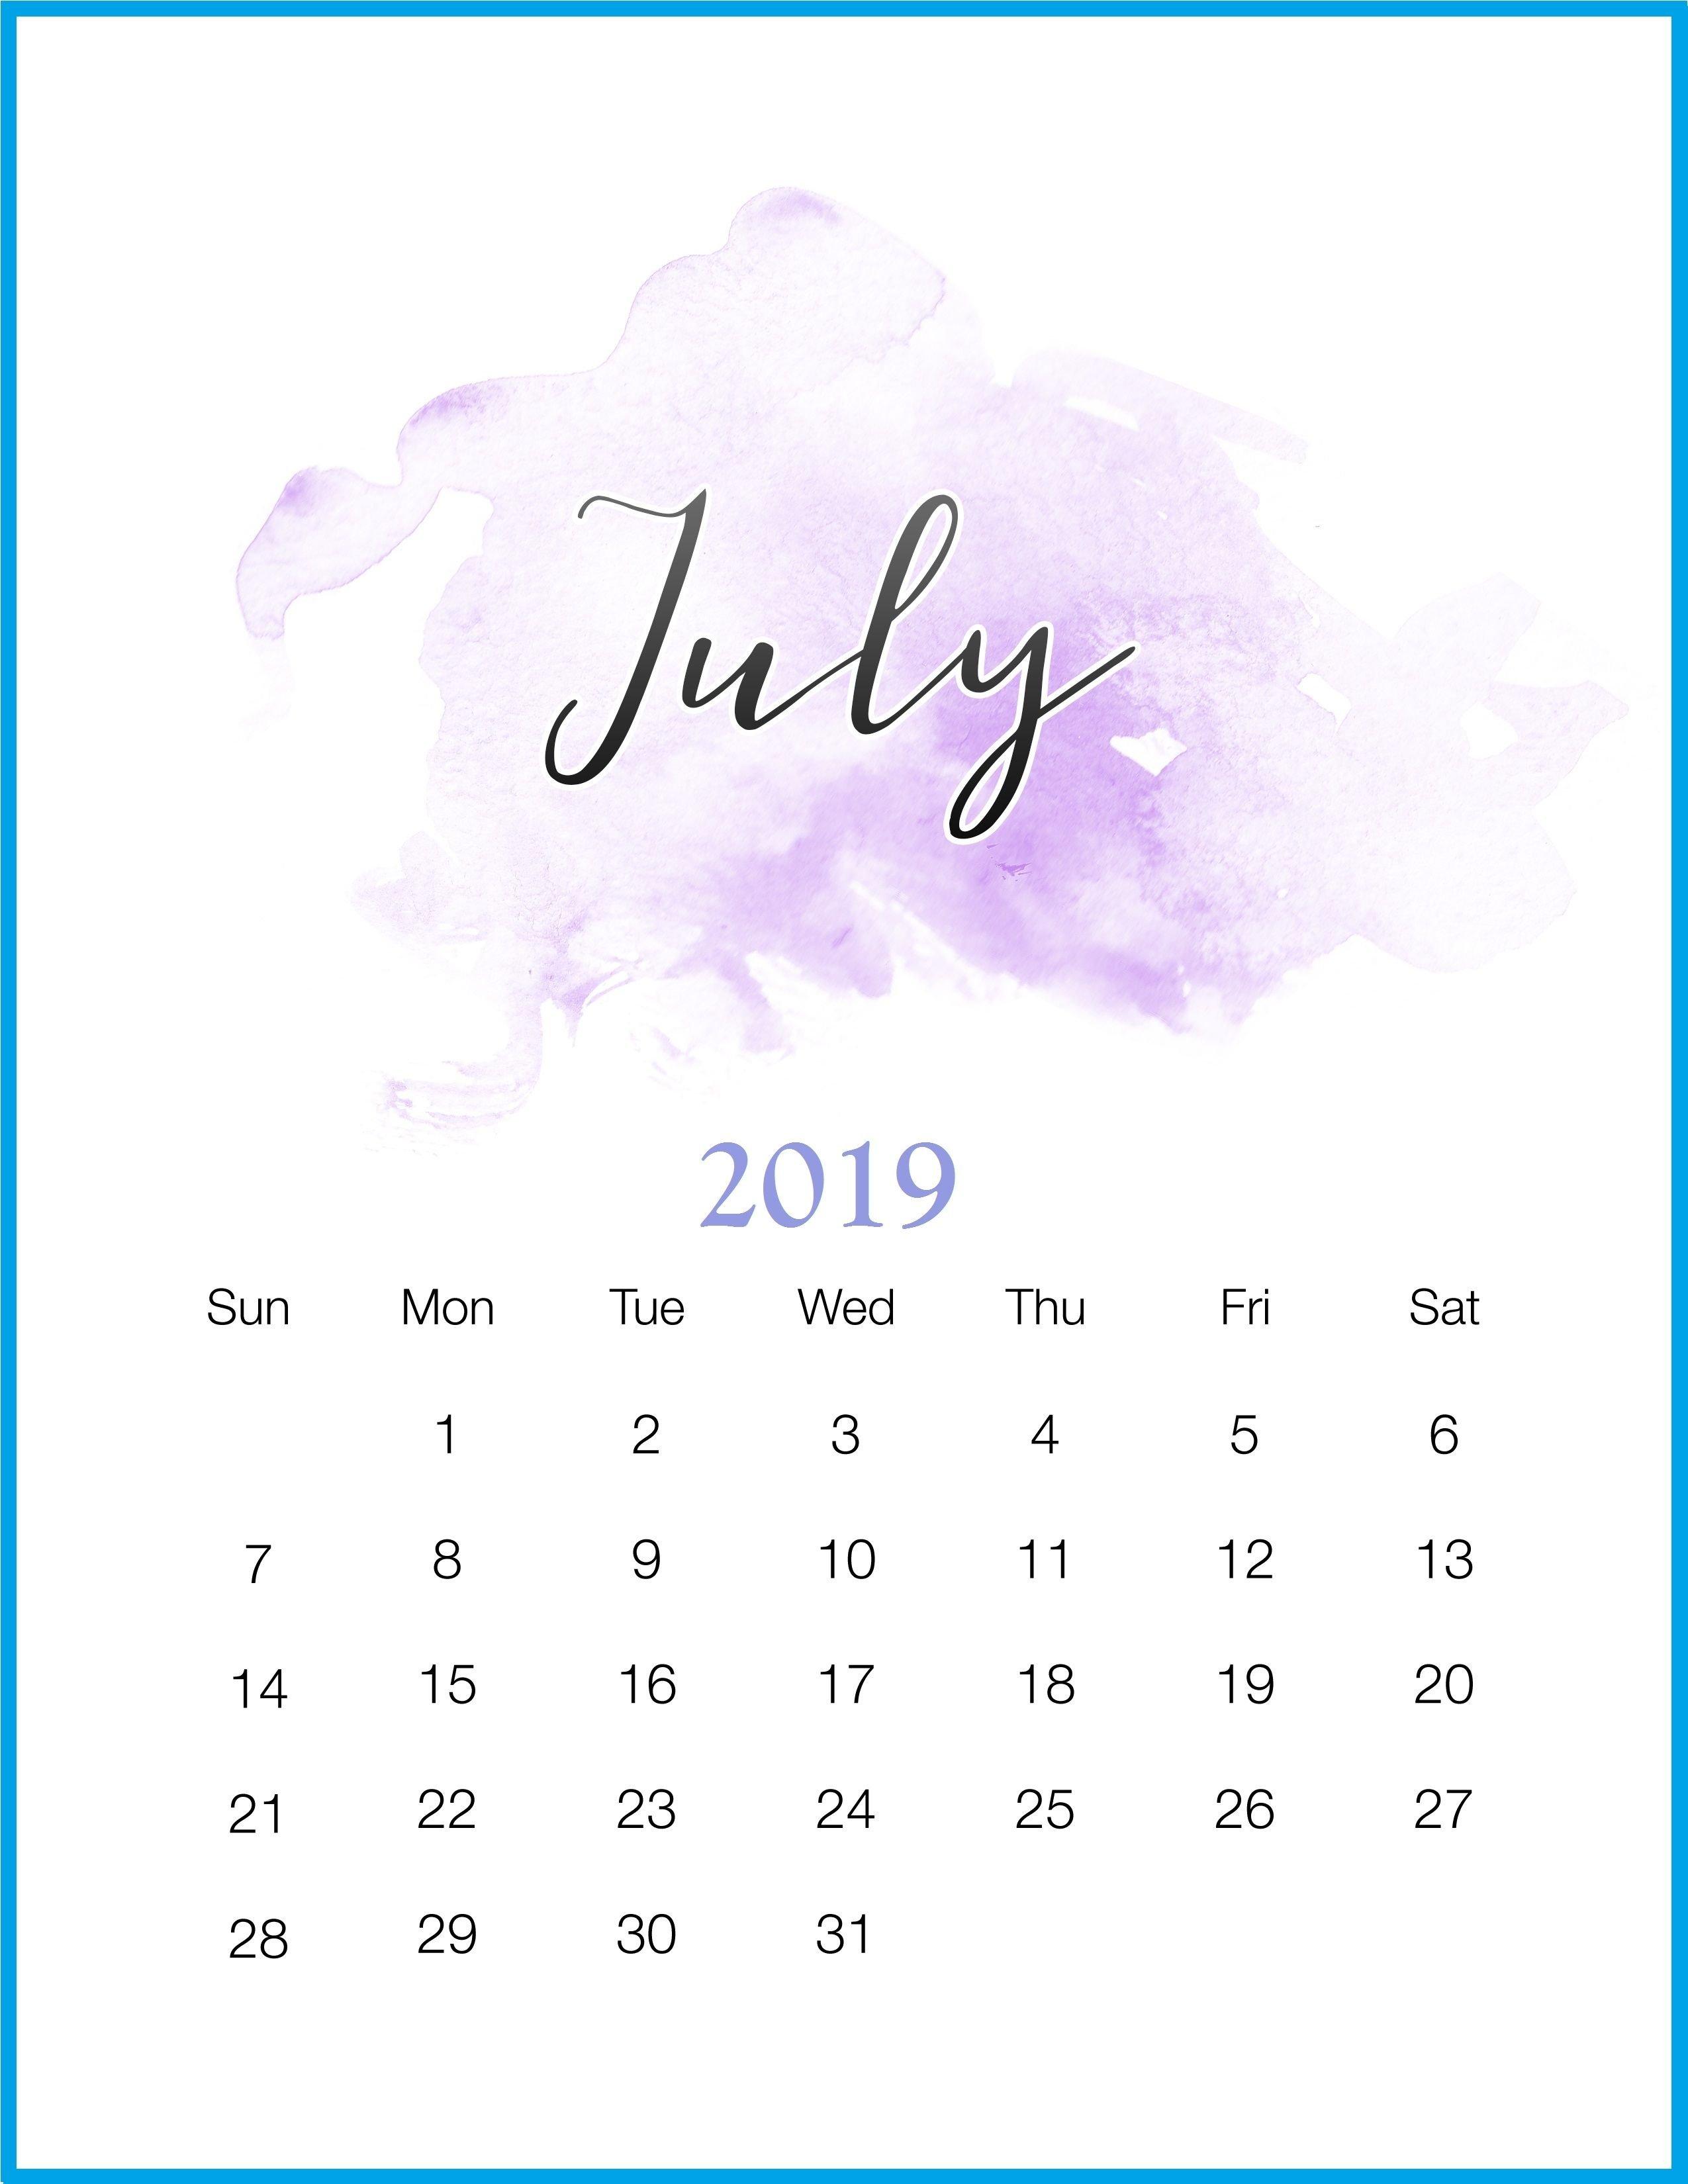 July 2019 Calendar Wallpapers - Wallpaper Cave July 1 2019 Calendar